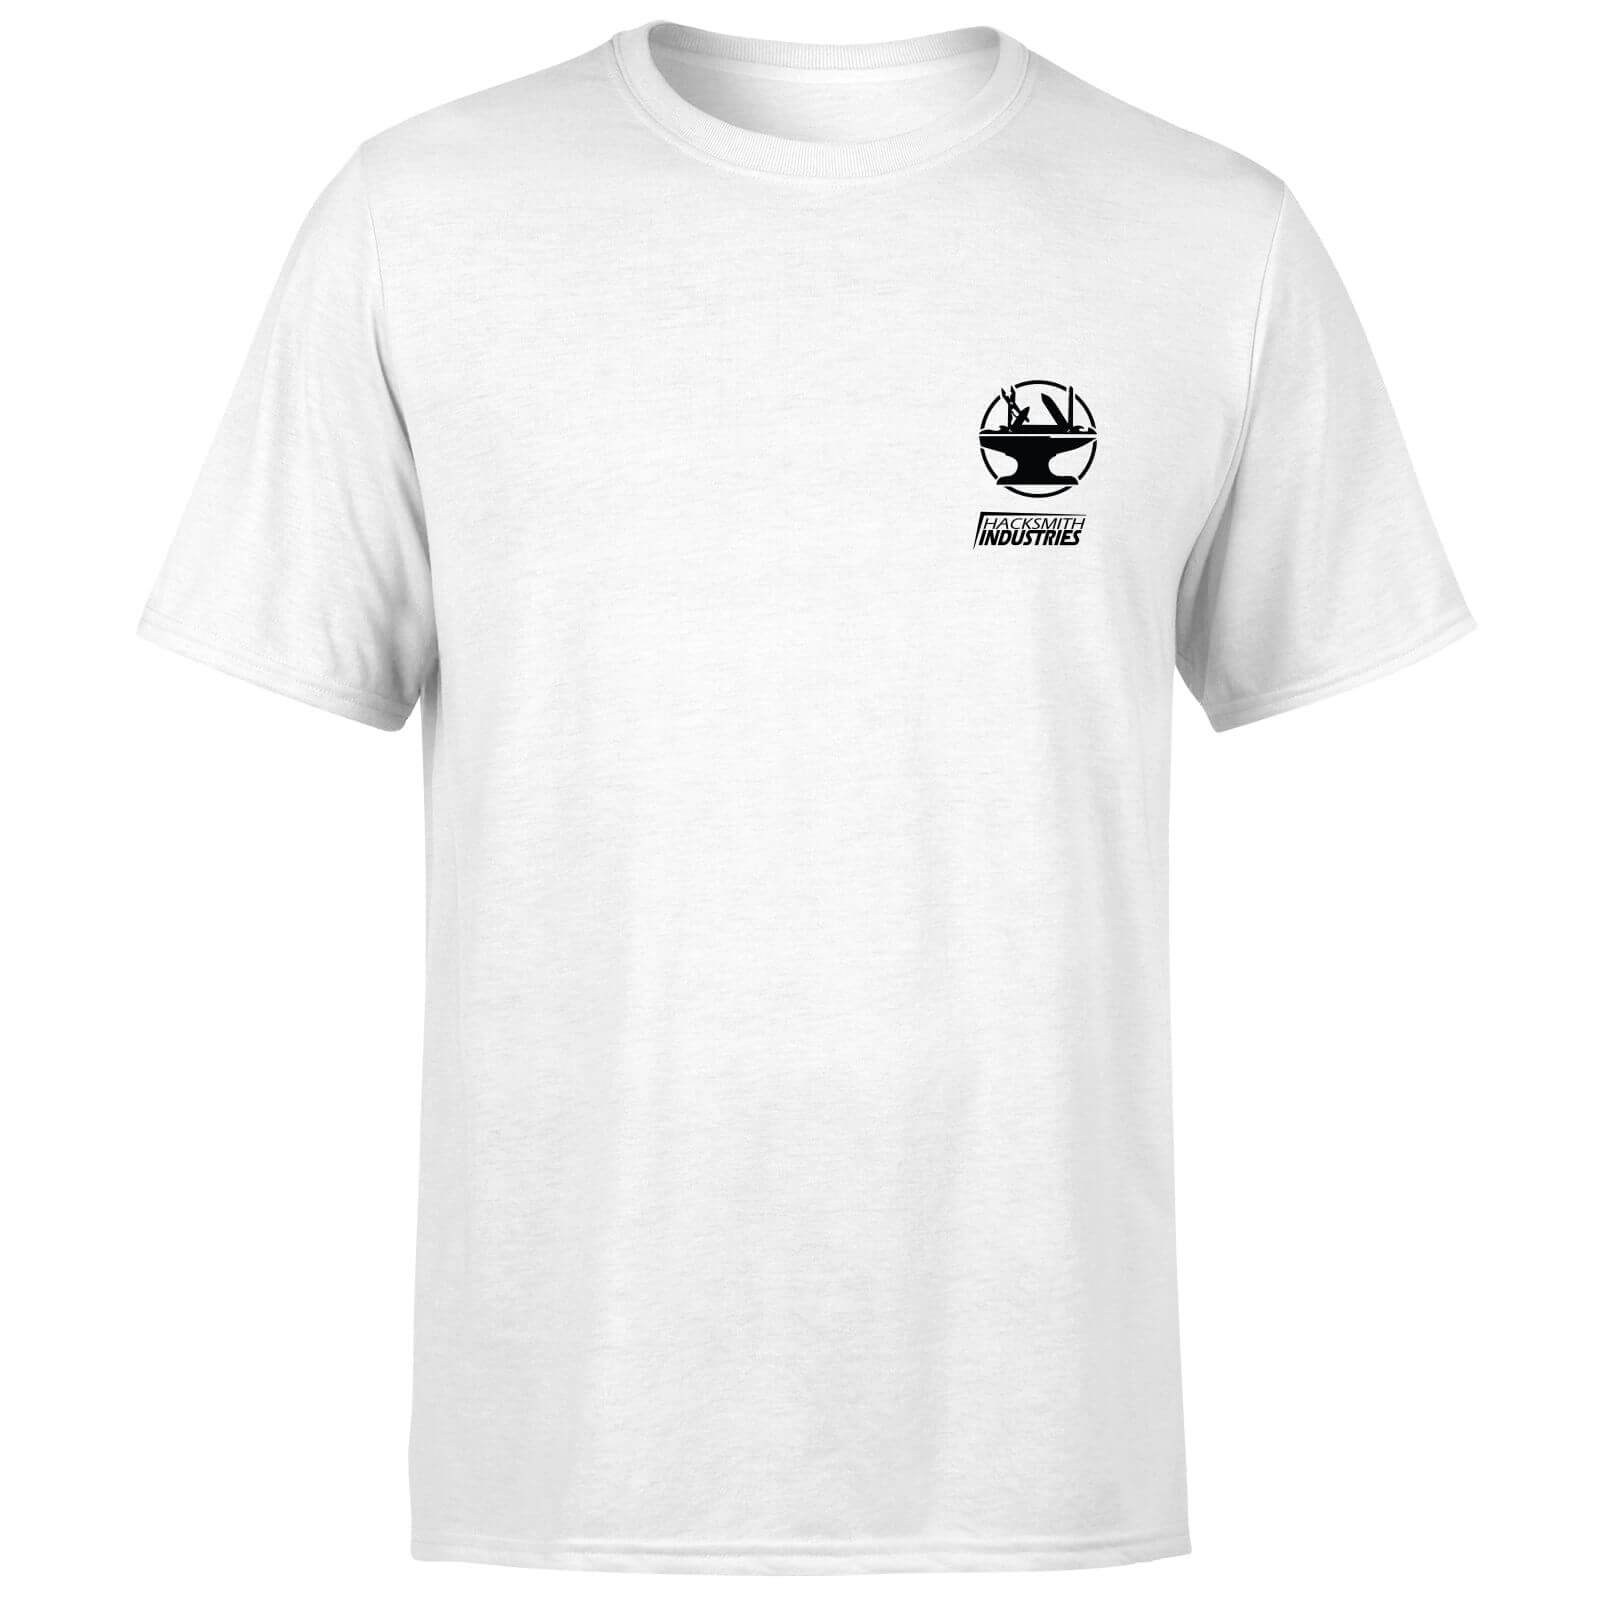 Hacksmith Industries Anvil Logo T-Shirt - White - 5XL - White